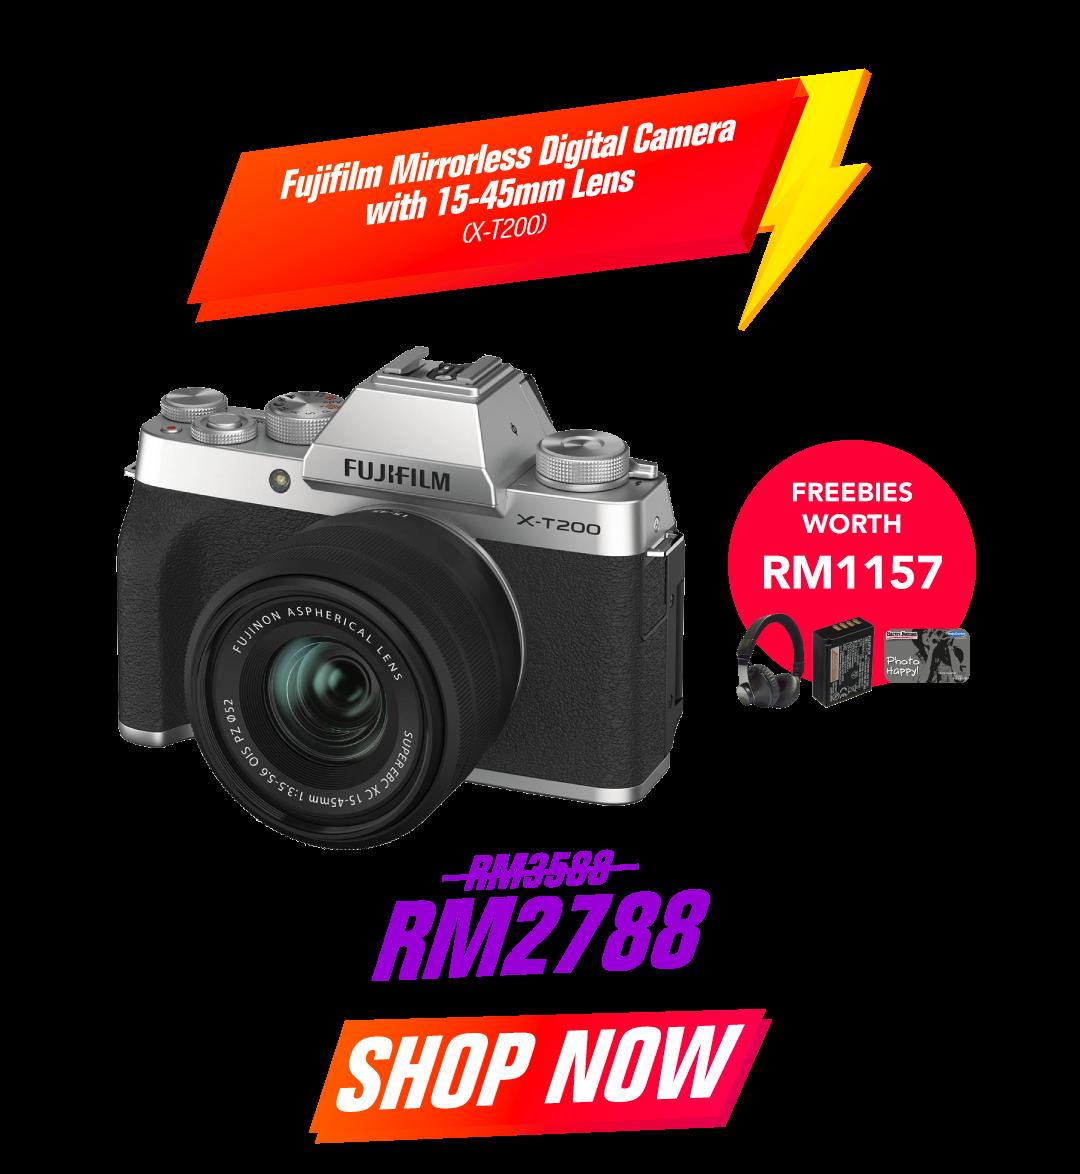 Fujifilm Mirrorless Digital Camera with 15-45mm Lens X-T200